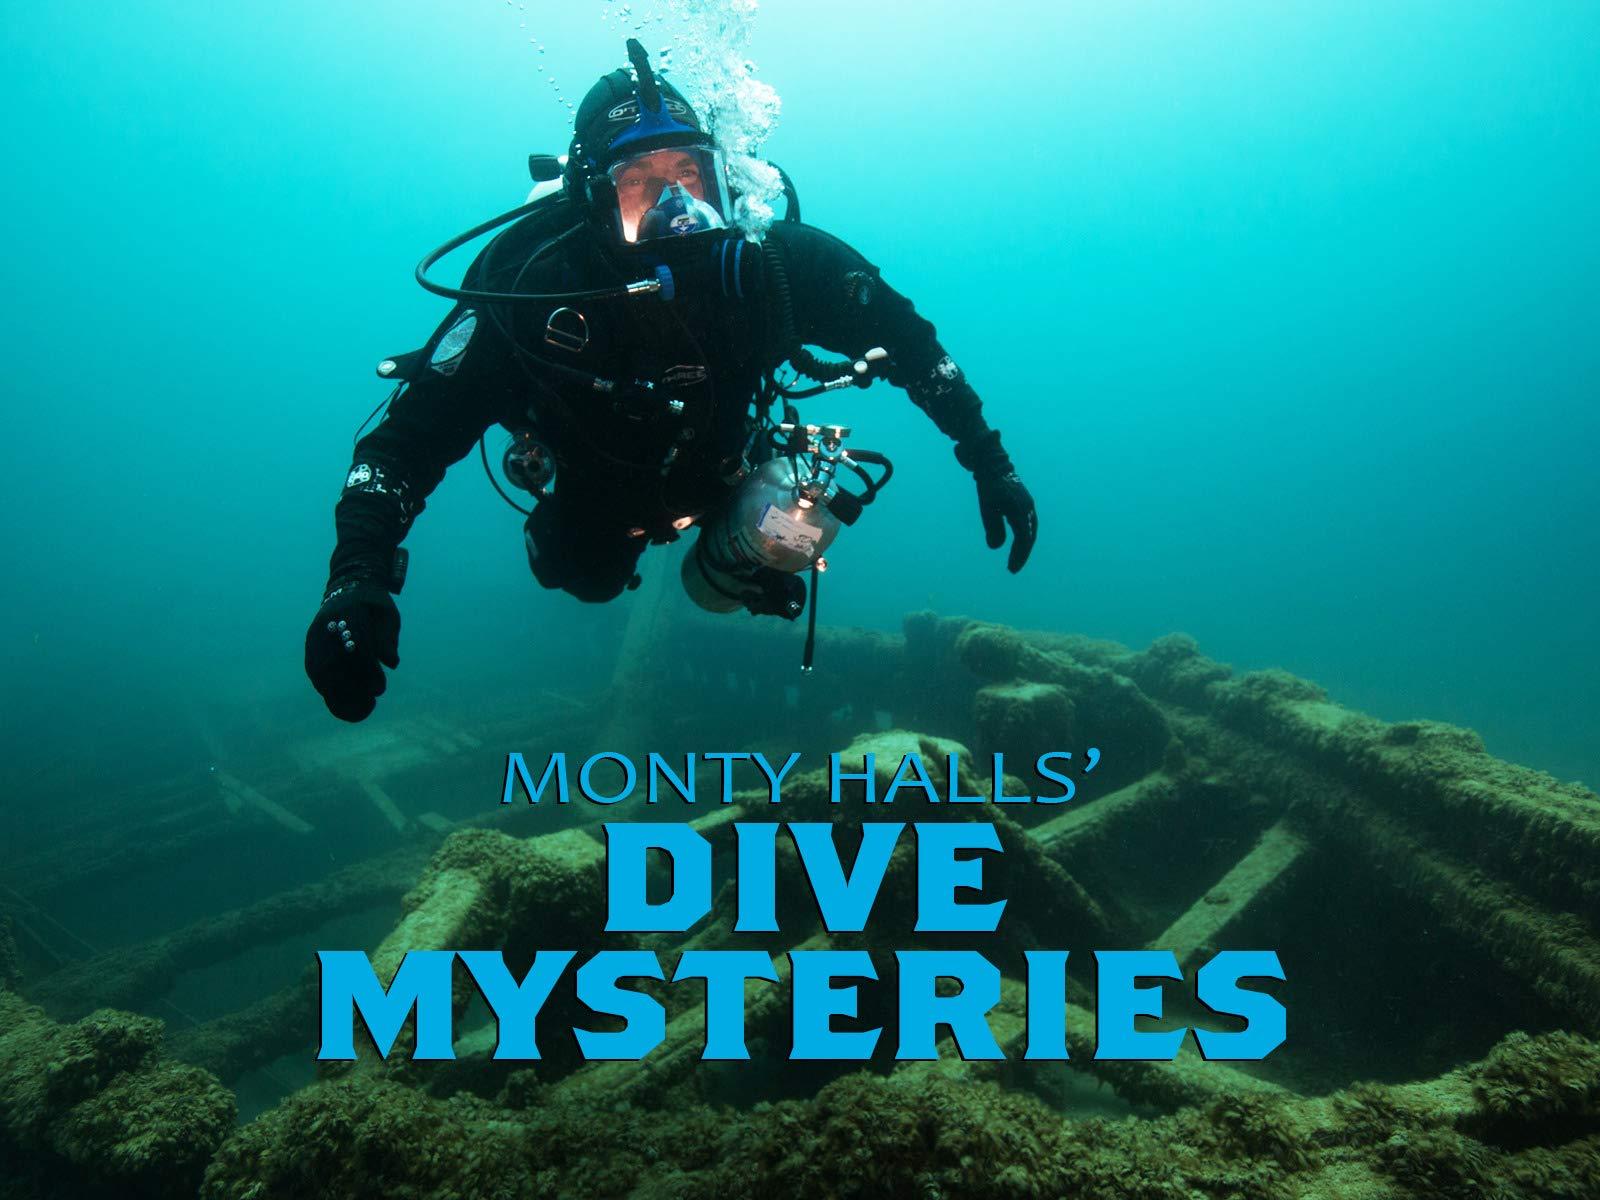 Monty Halls' Dive Mysteries